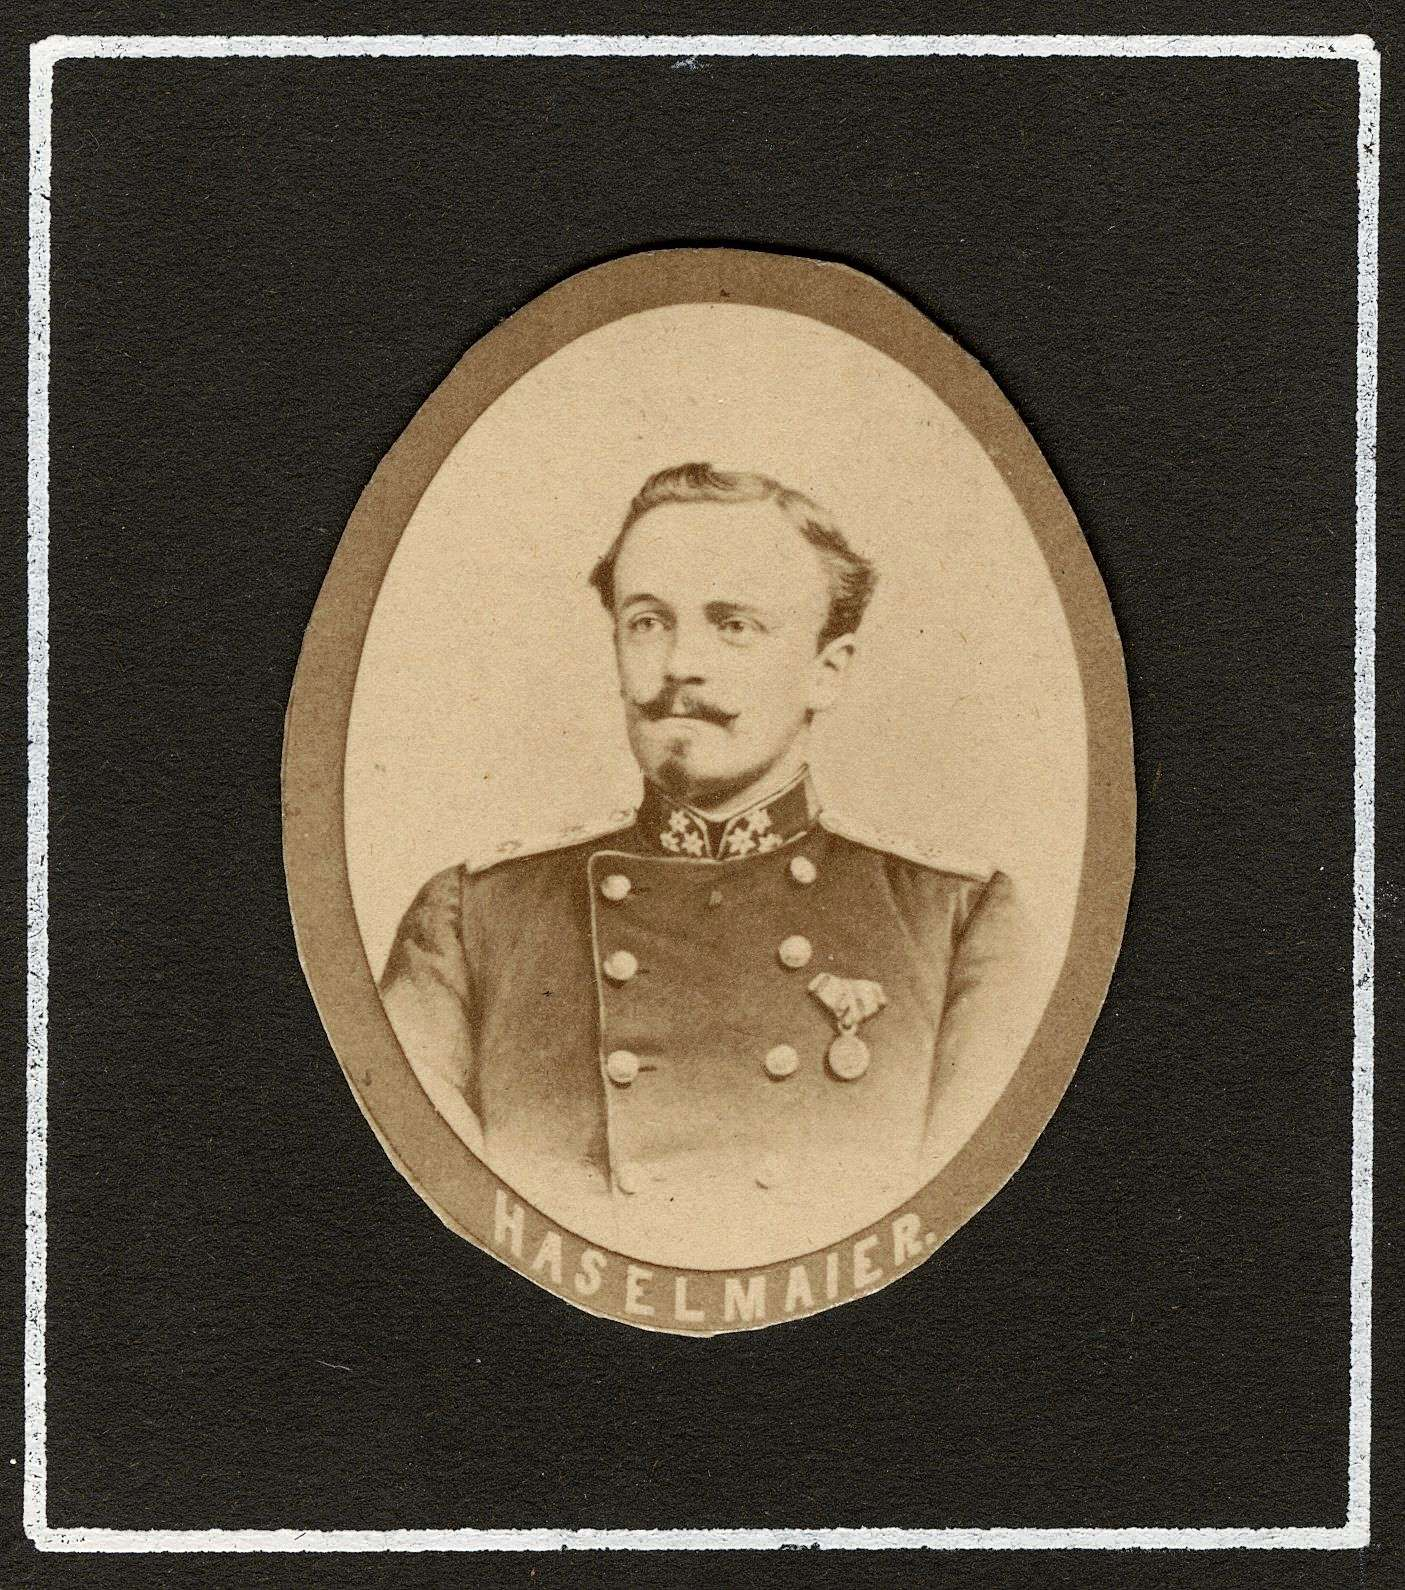 Haselmaier, Karl, Bild 1